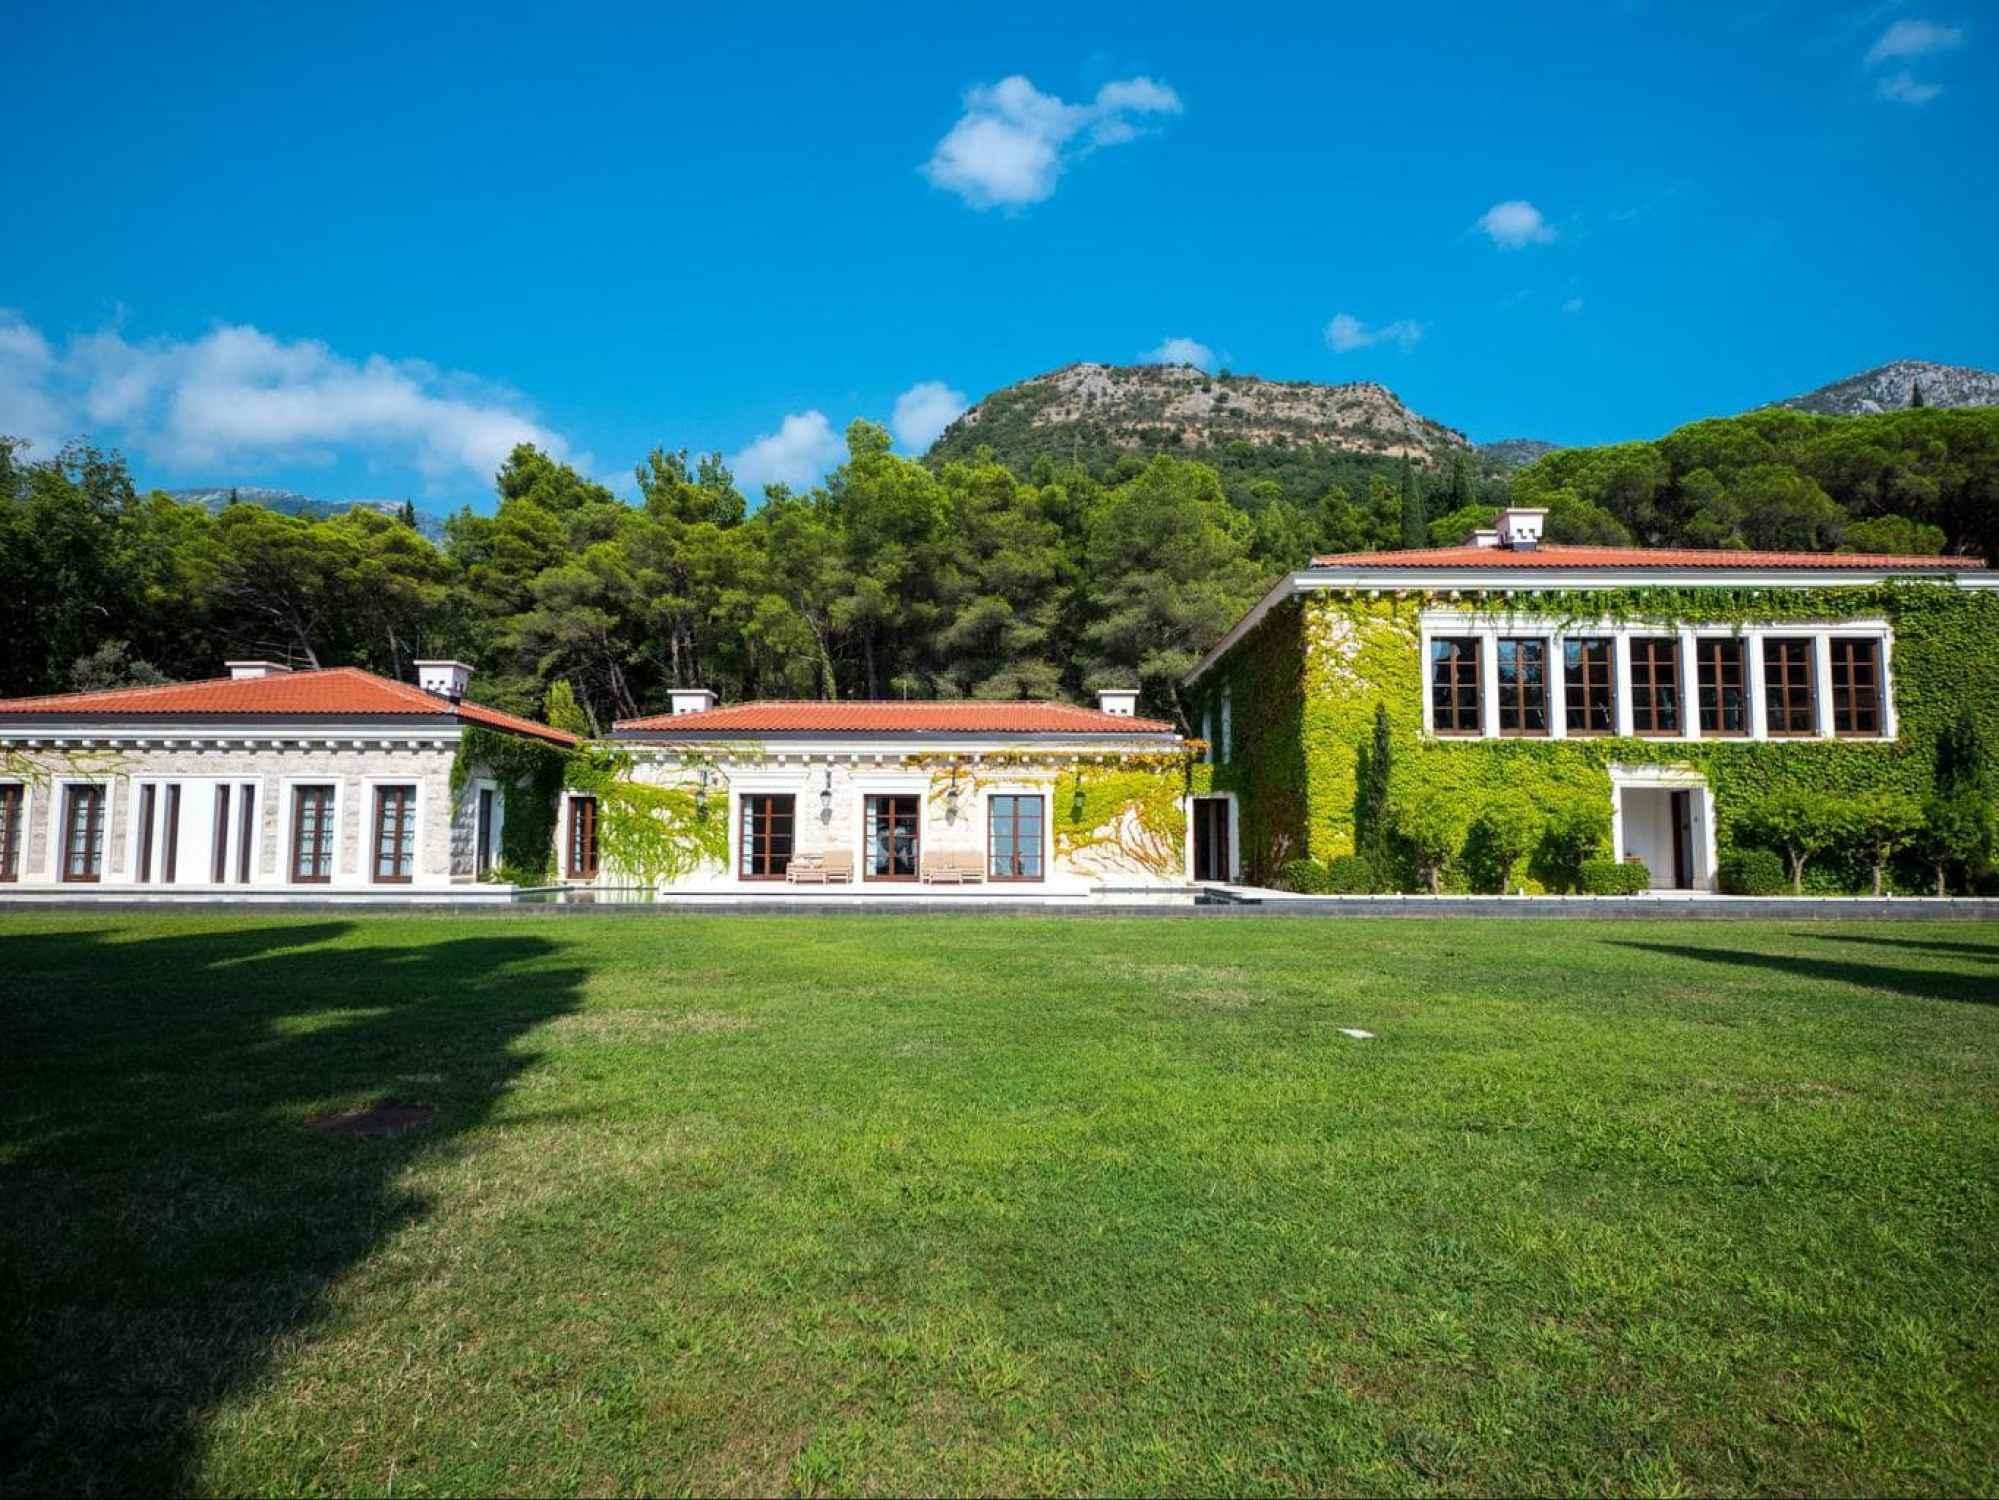 Spa building at Aman Sveti Stefan